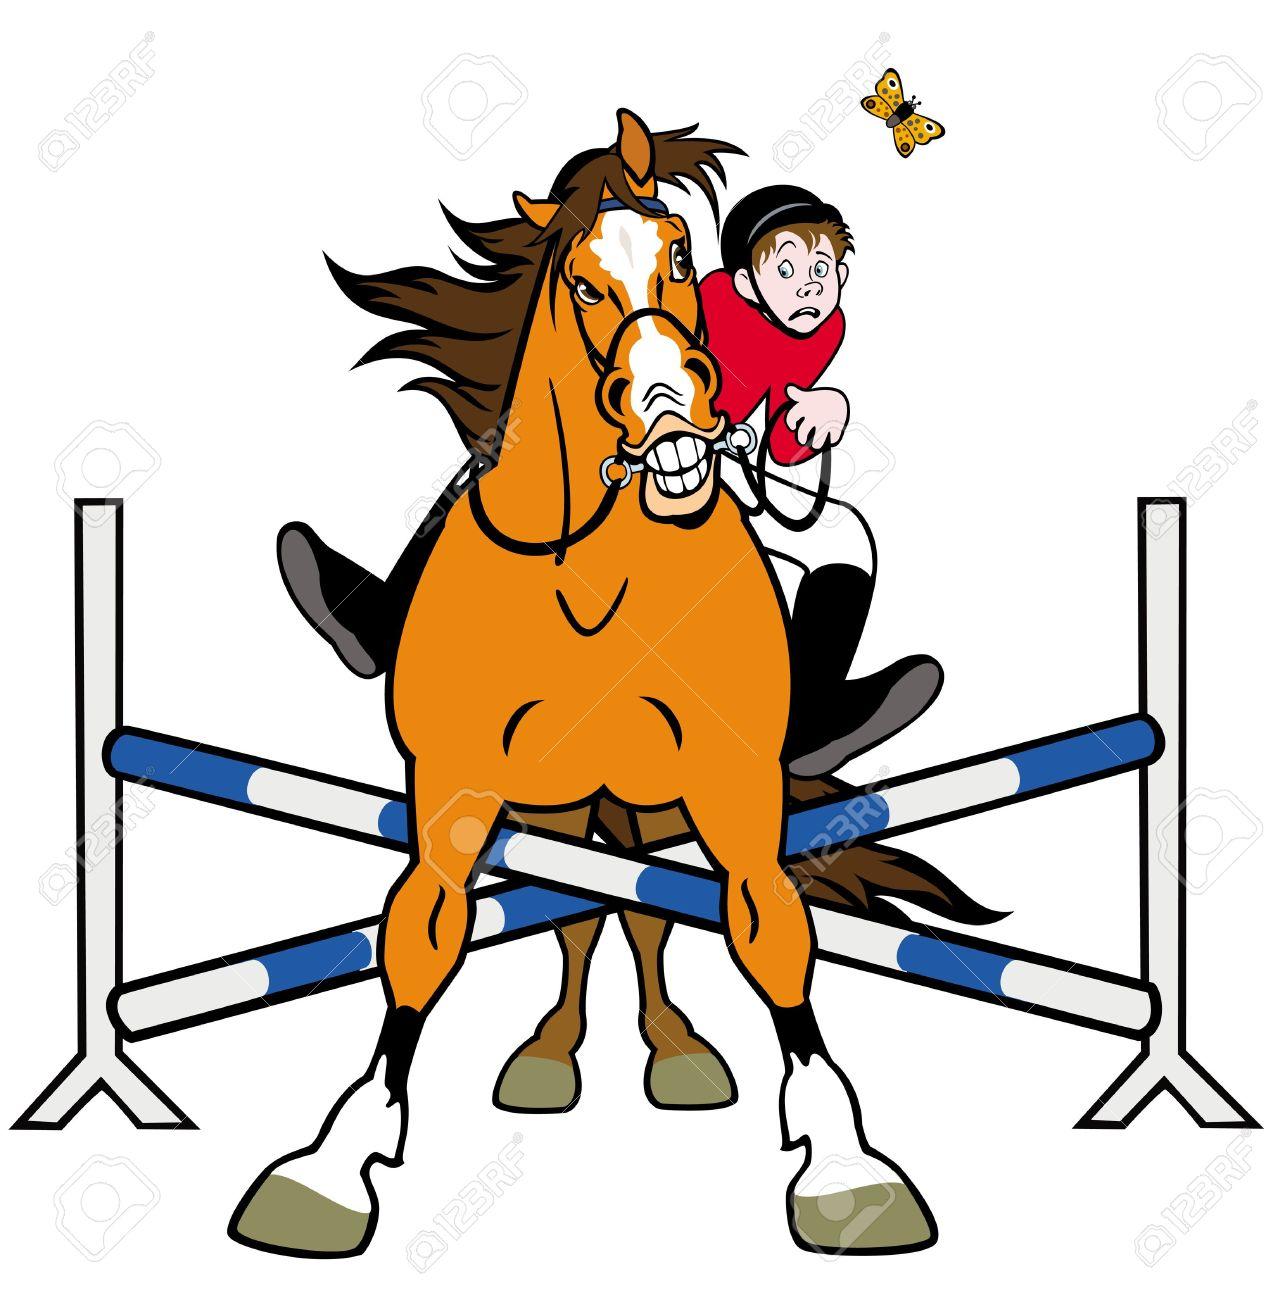 1285x1300 Equestrian Sport Clipart